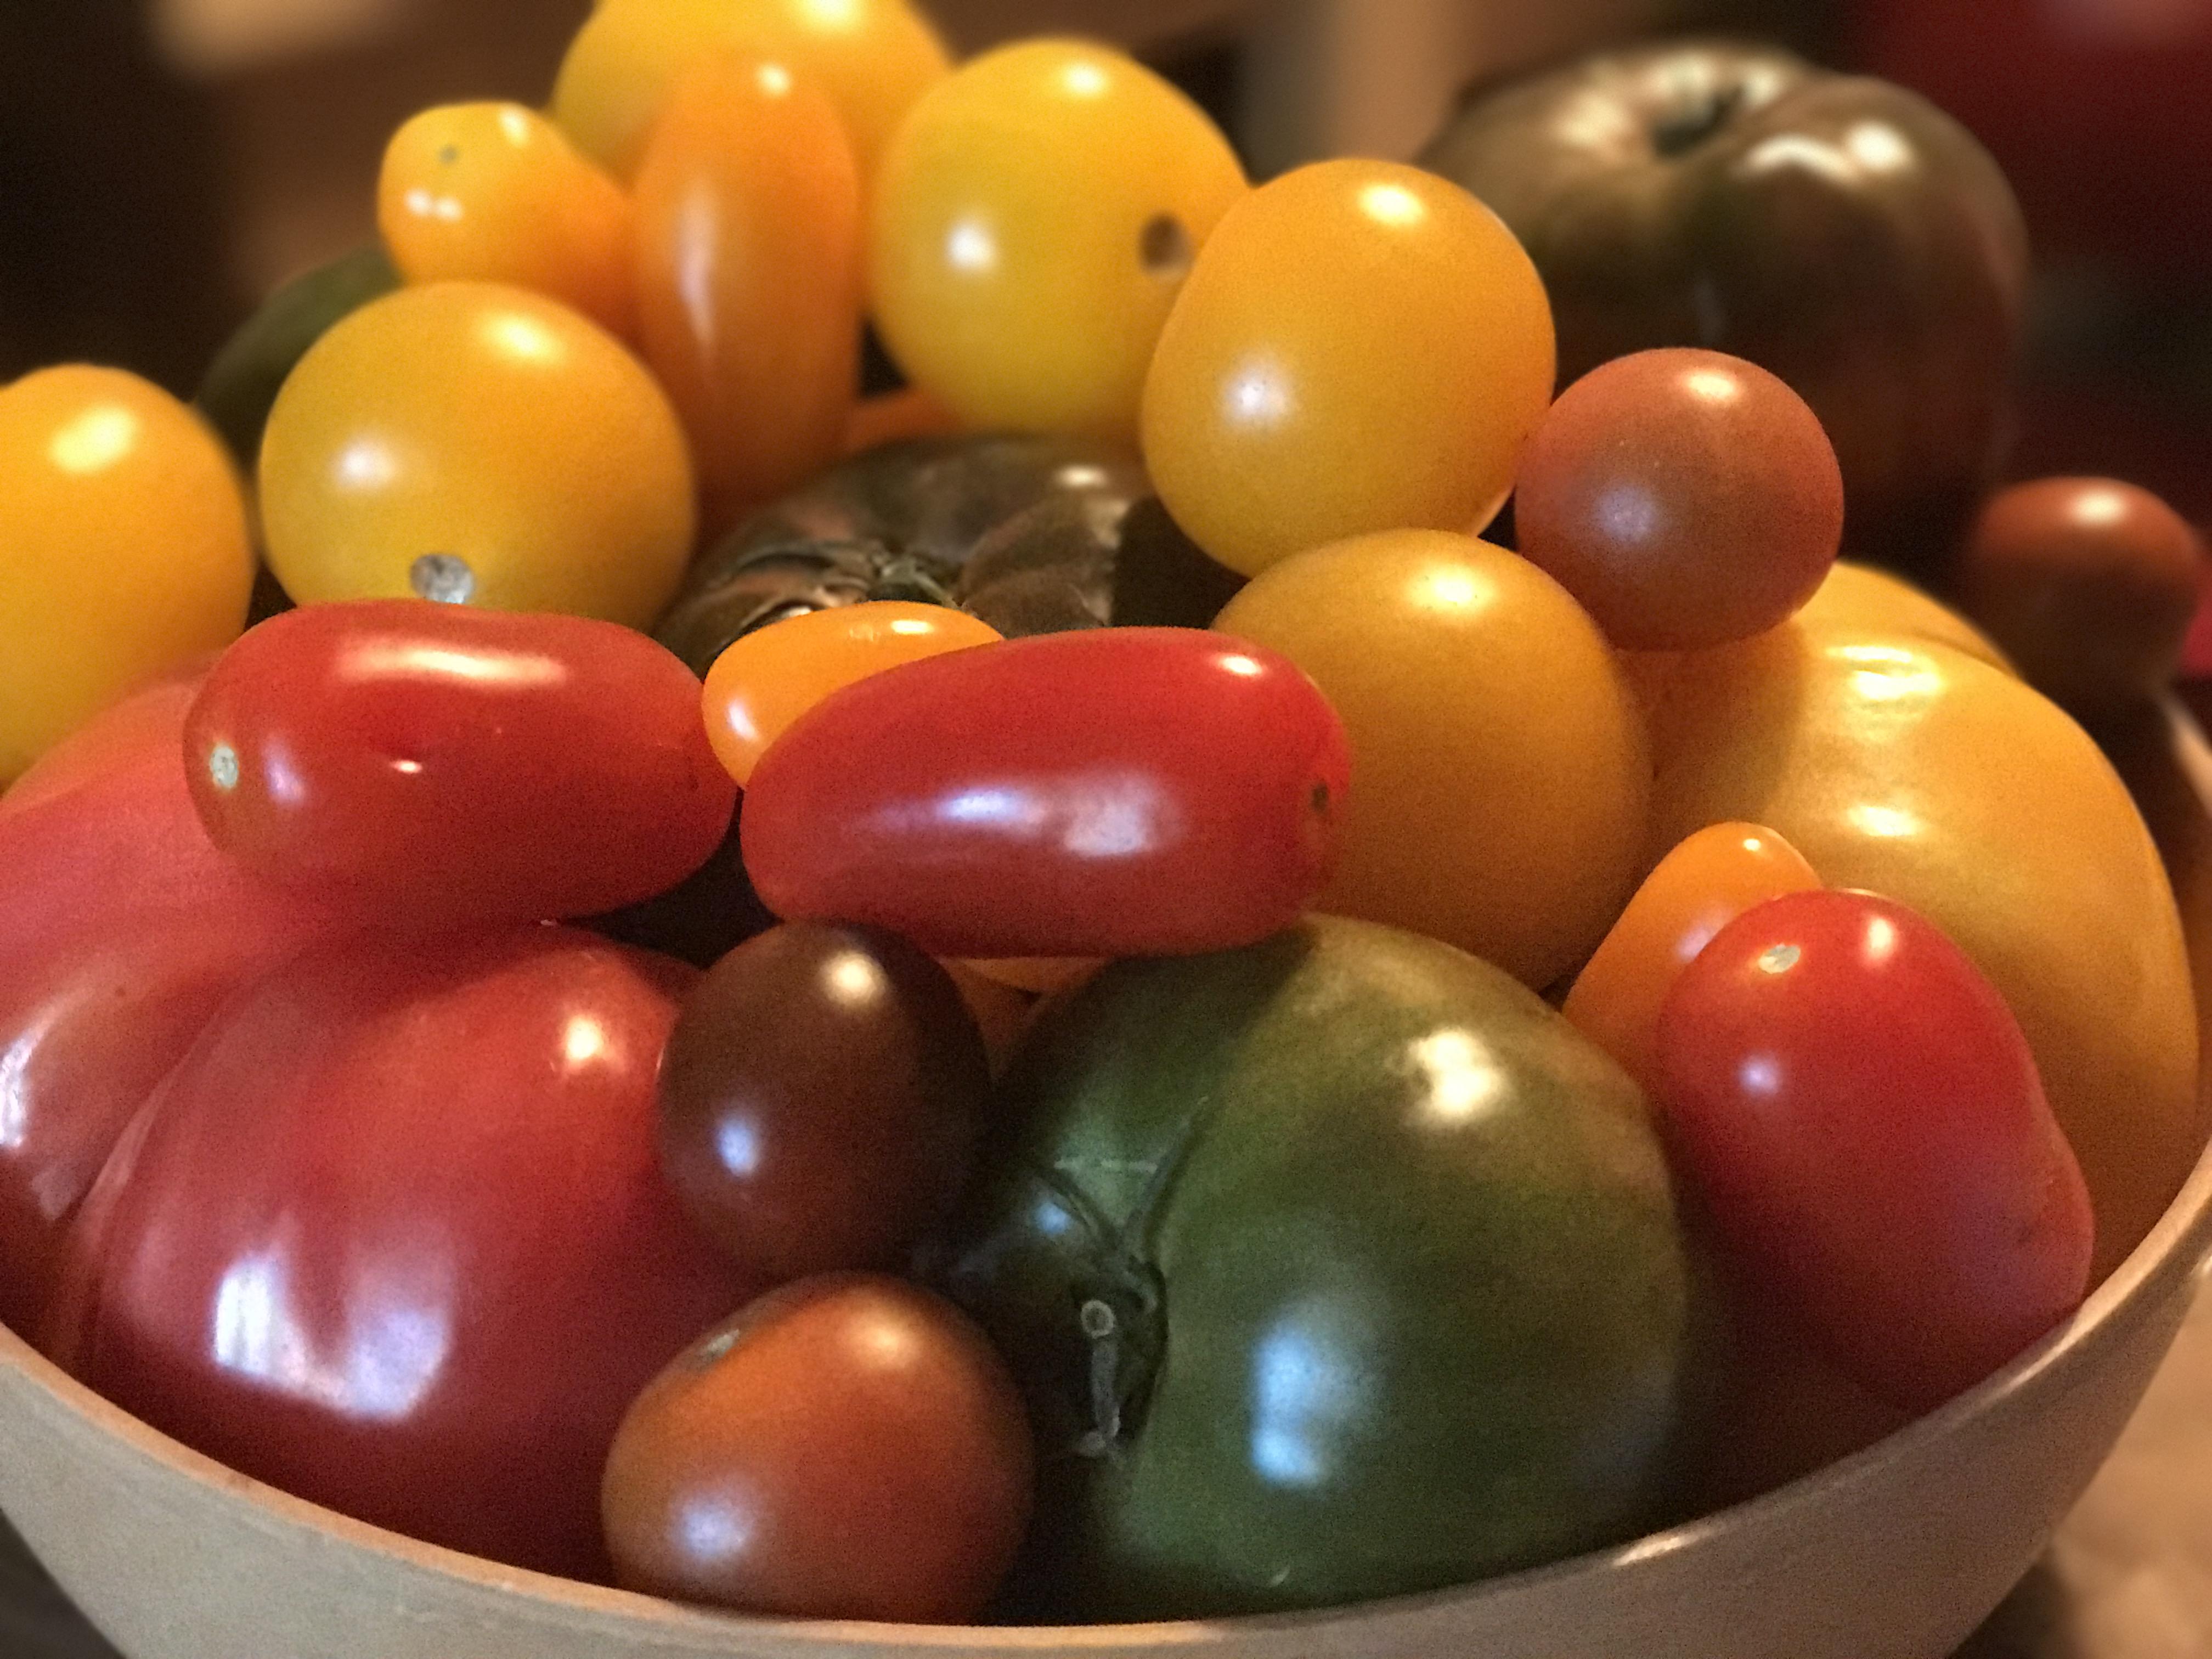 Local Grown Florida Heirloom Tomatoes